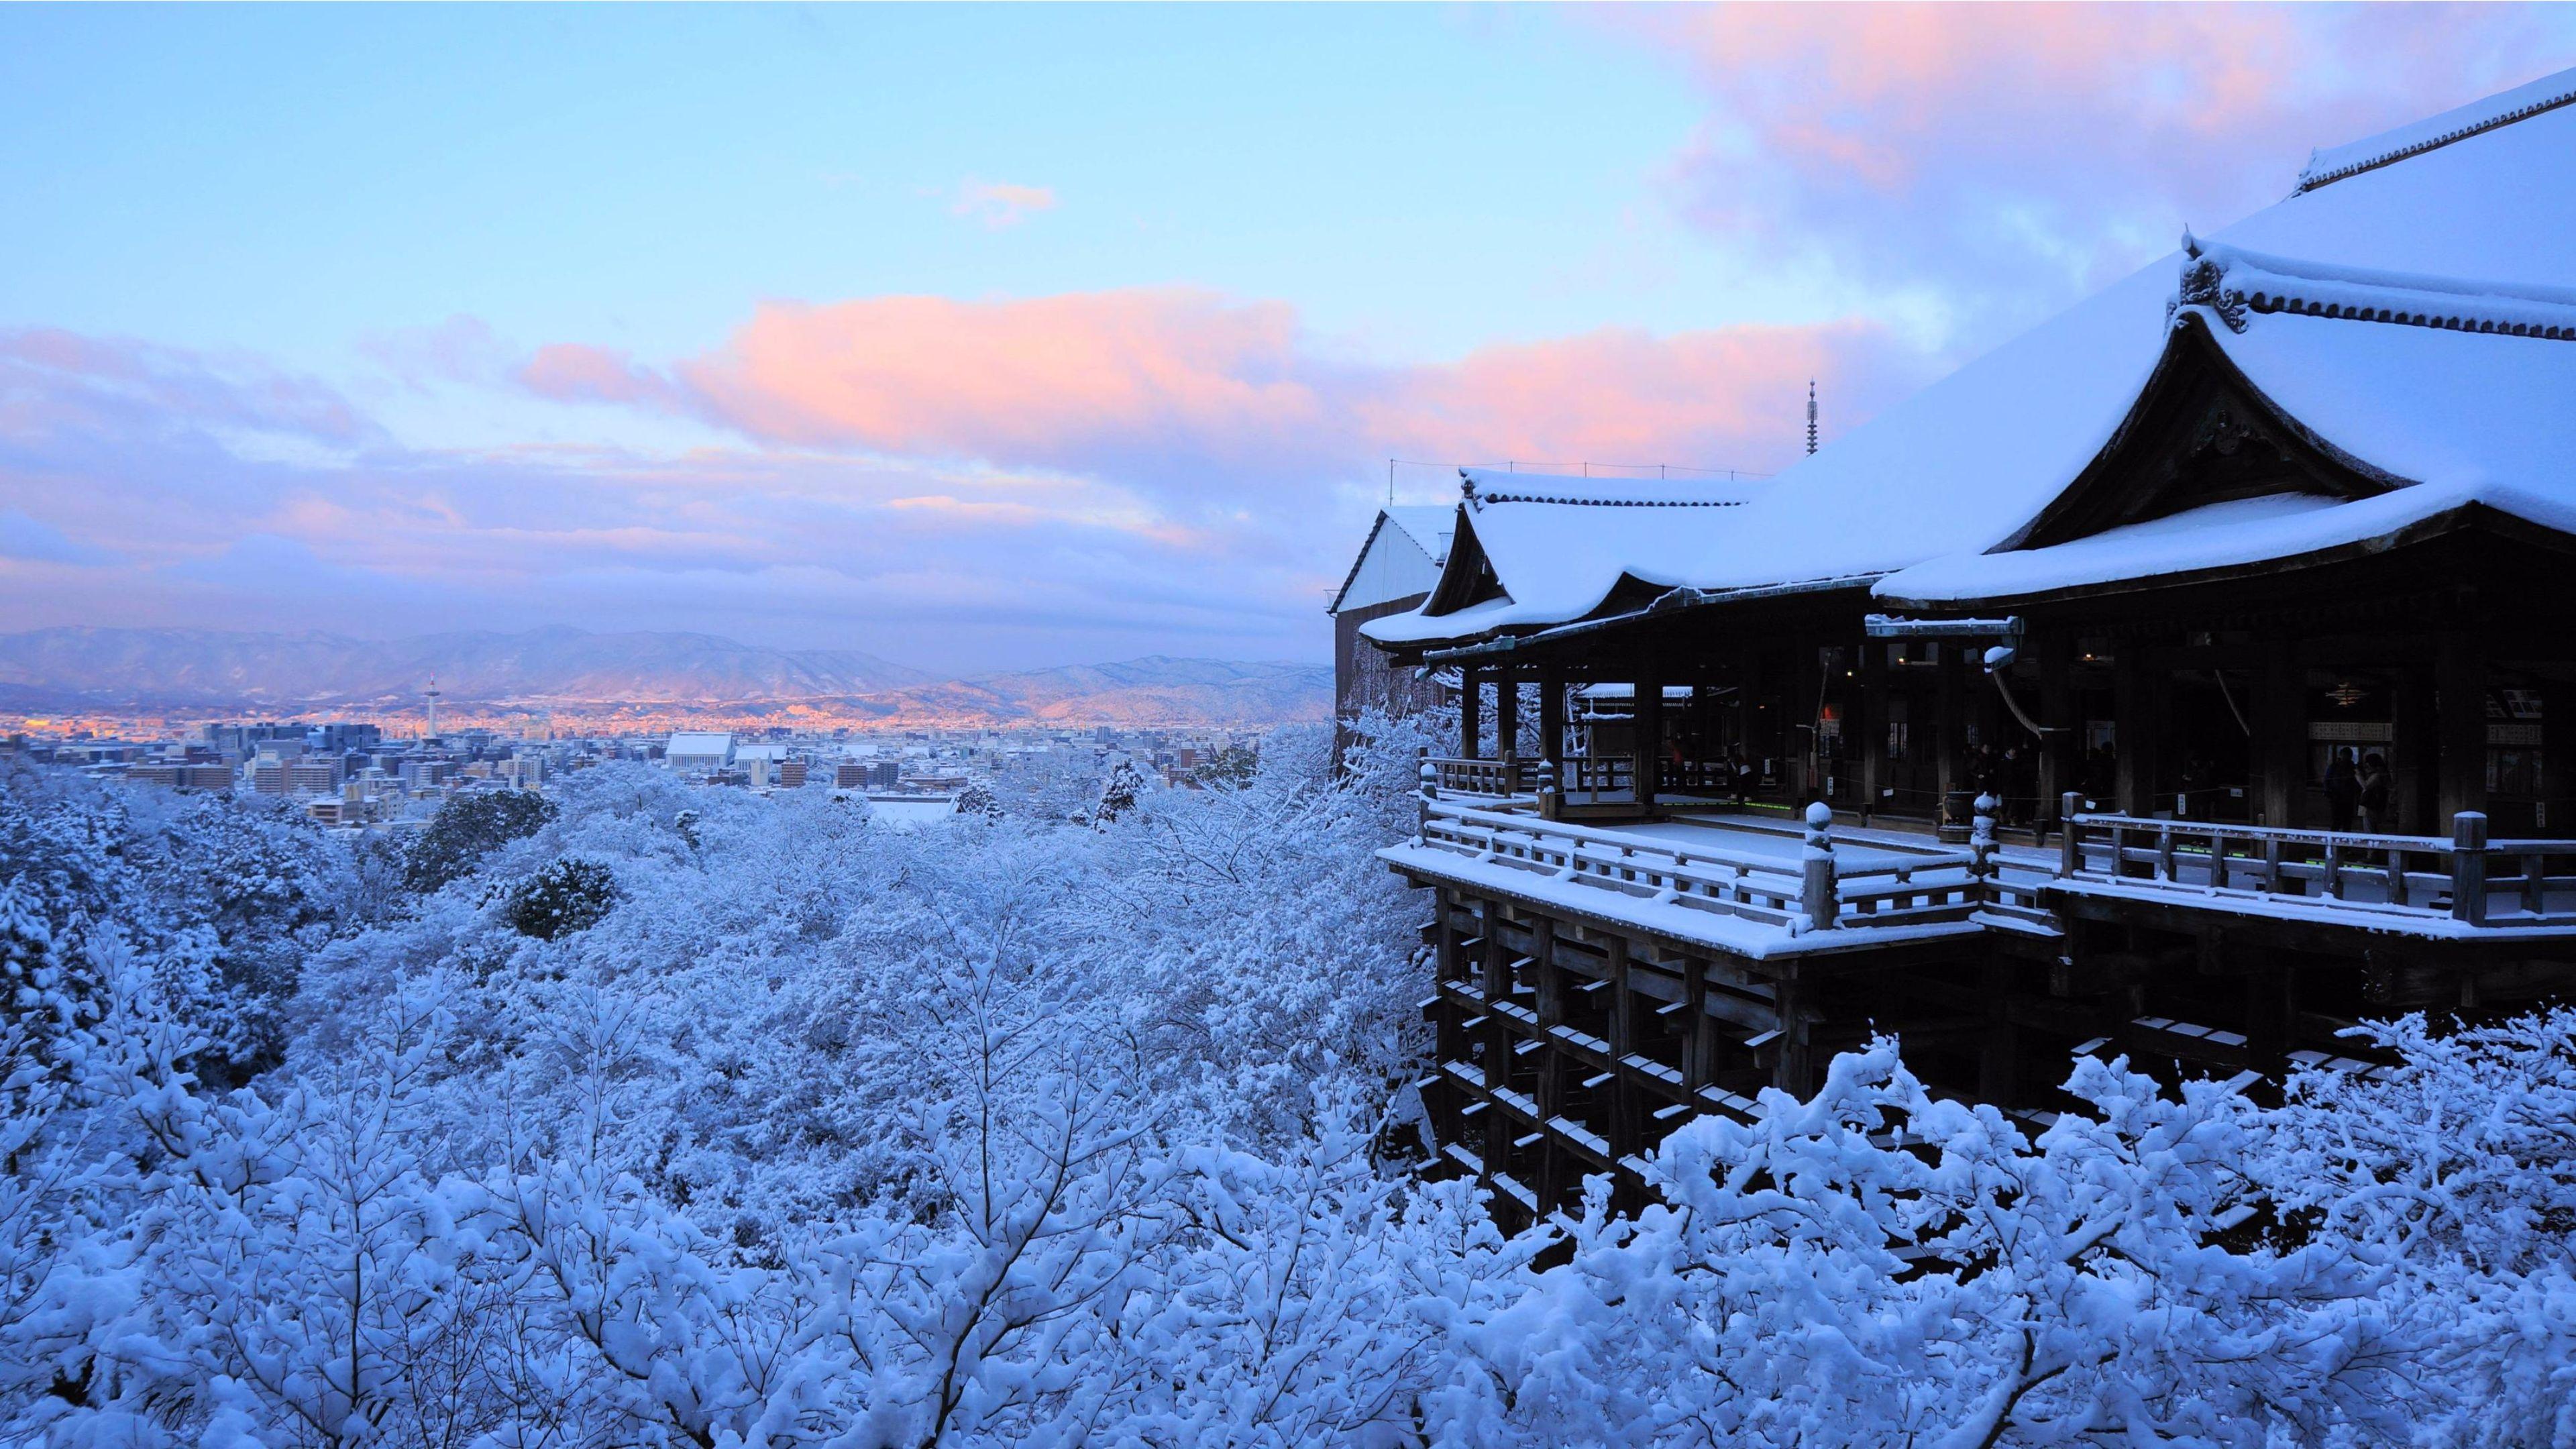 Amazing Winter 2016 Kyoto Japan 4K Wallpaper 4K 3840x2160